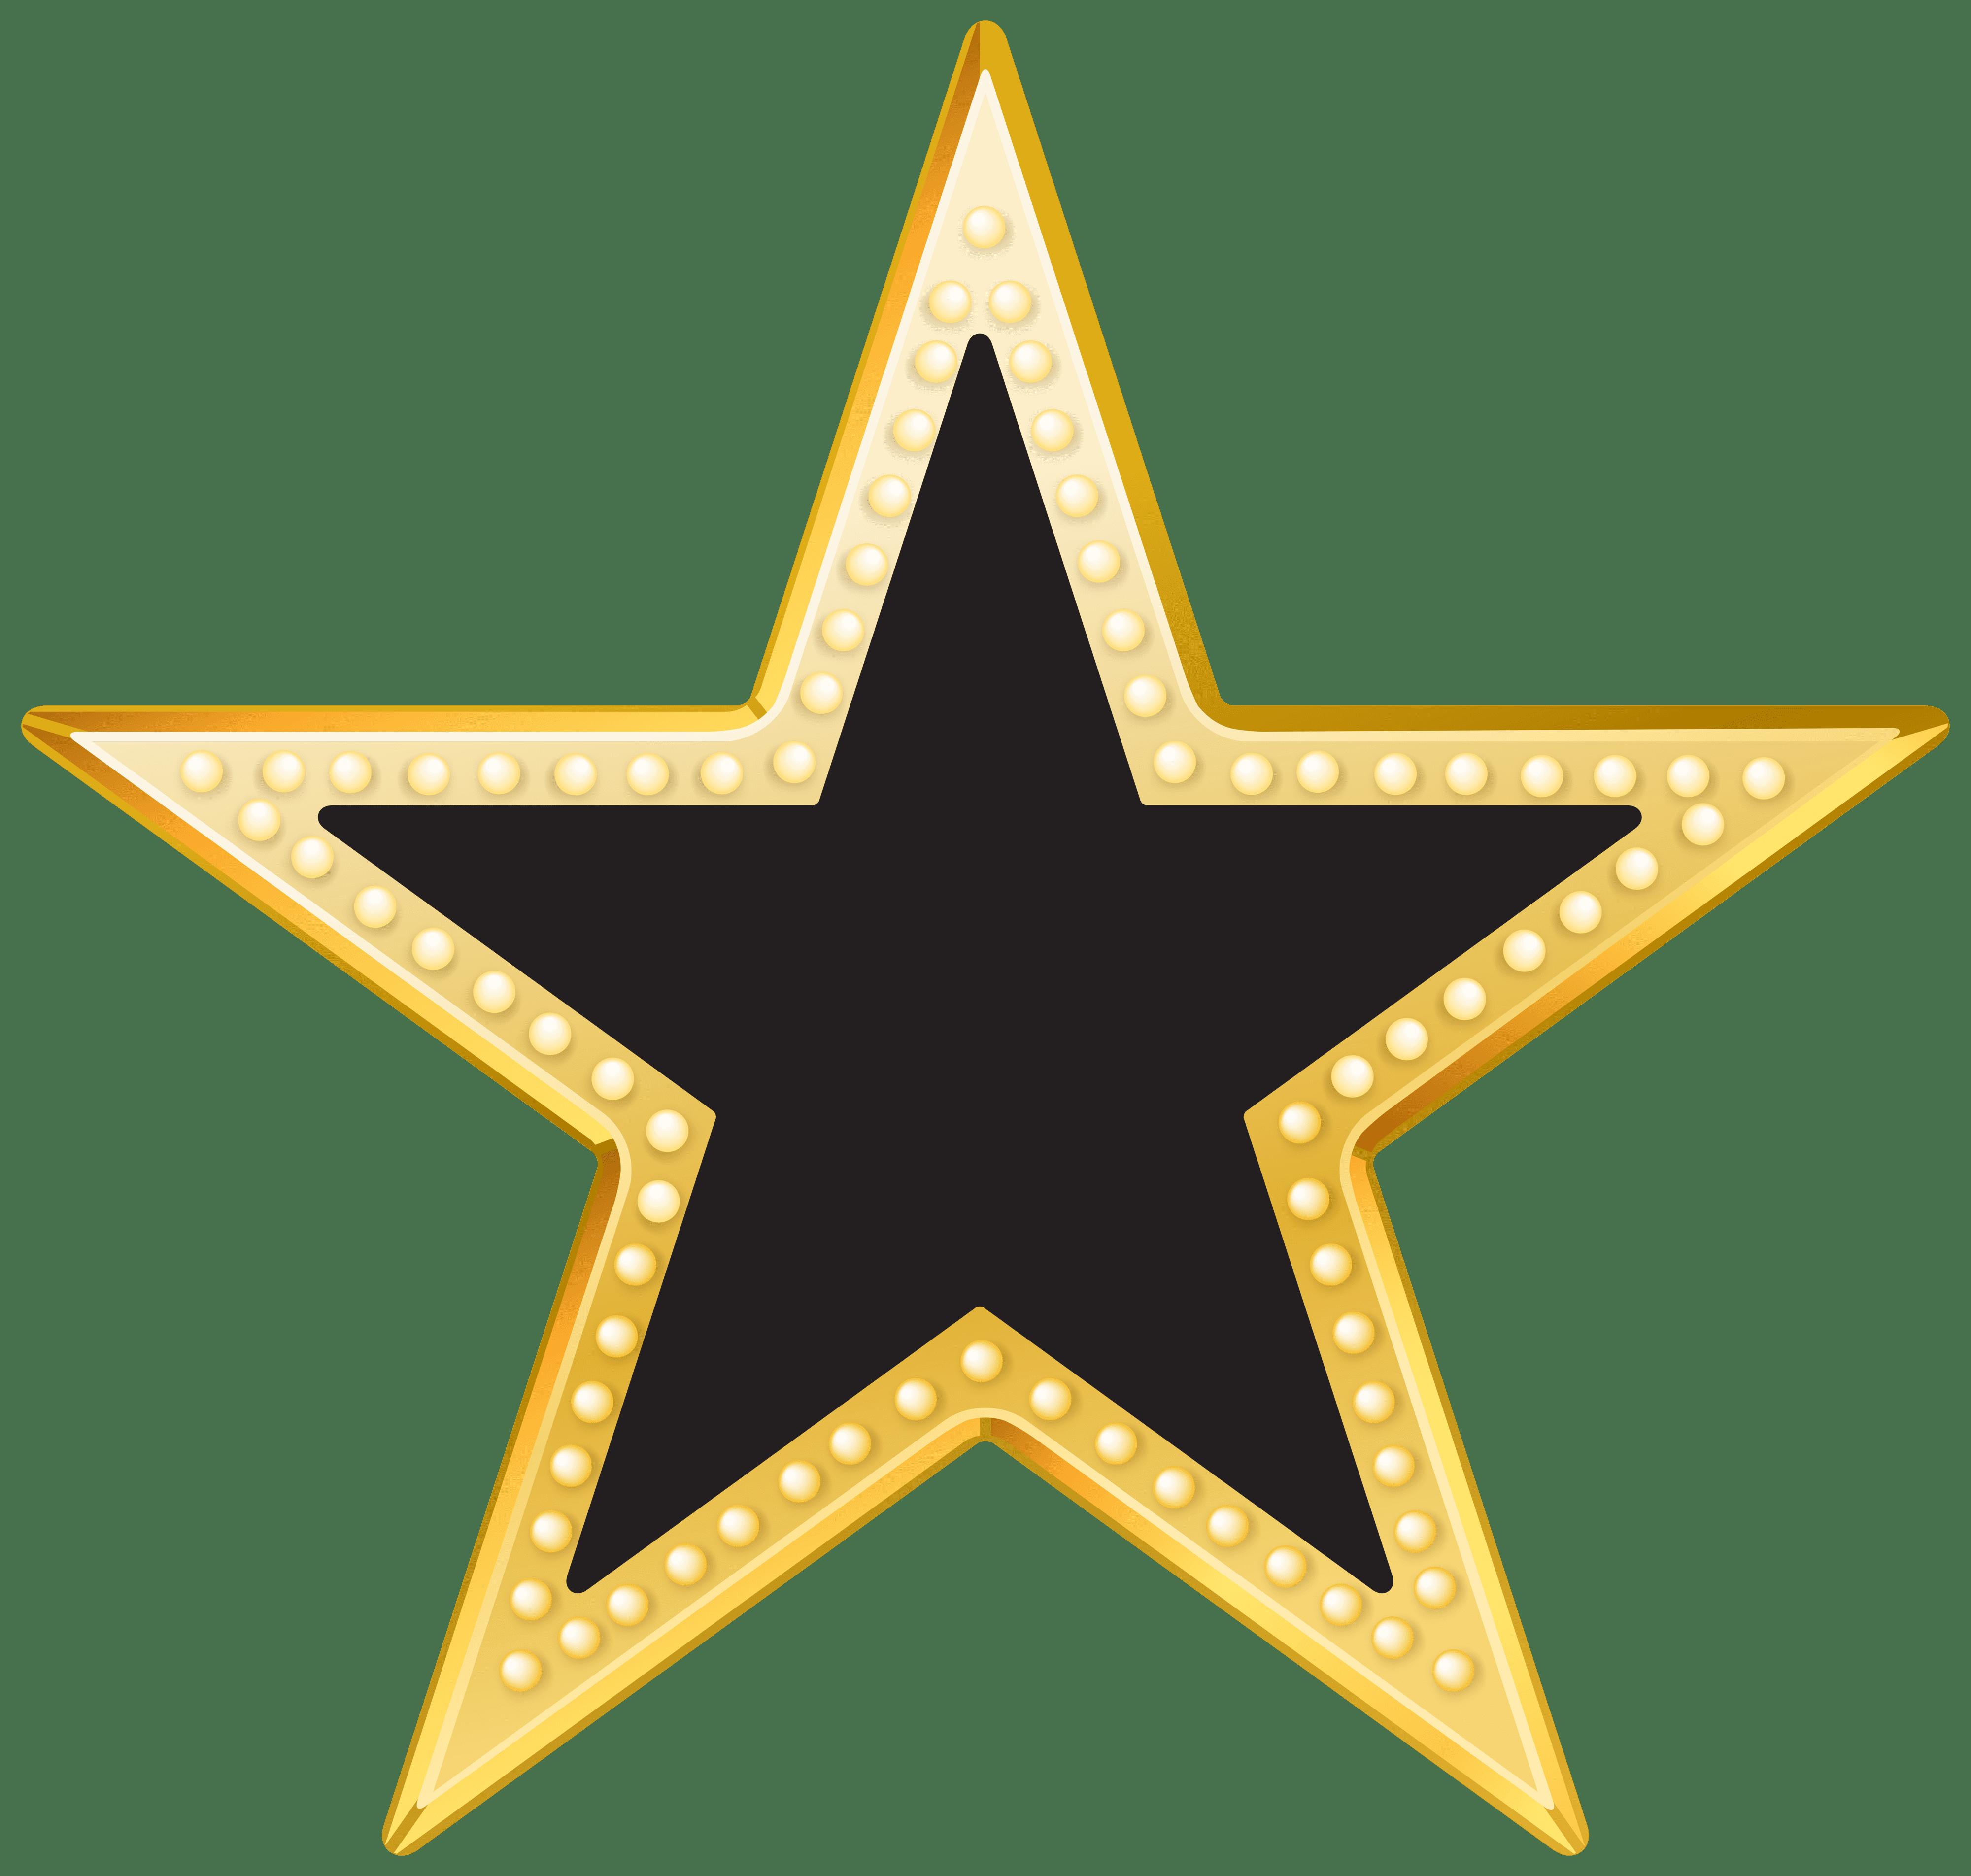 Transparent clipart star clip art freeuse library Gold And Black Star PNG Transparent Clip Art Image clip art freeuse library